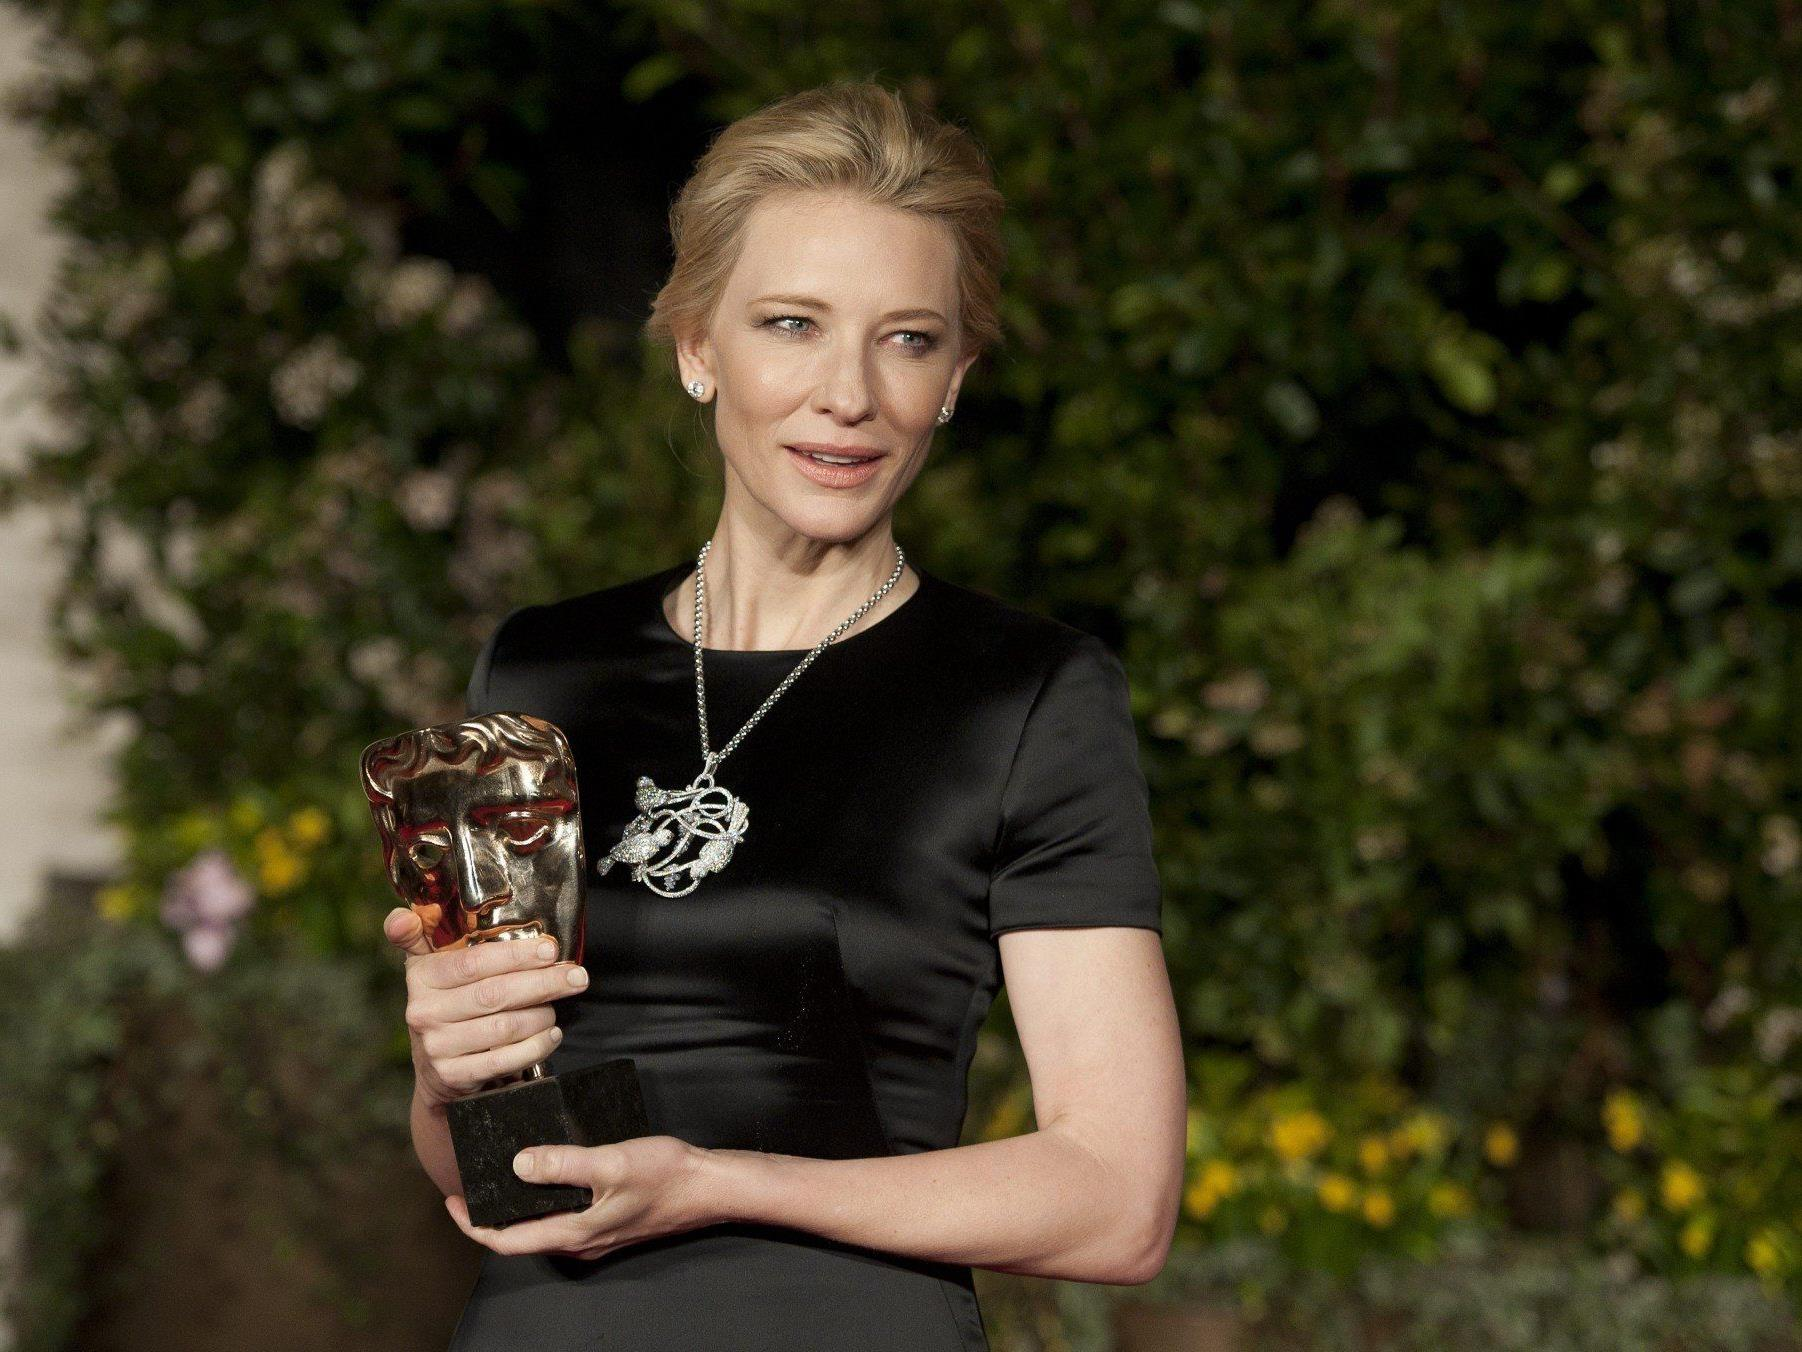 Cate Blanchett widmet Preis Philip Seymour Hoffman